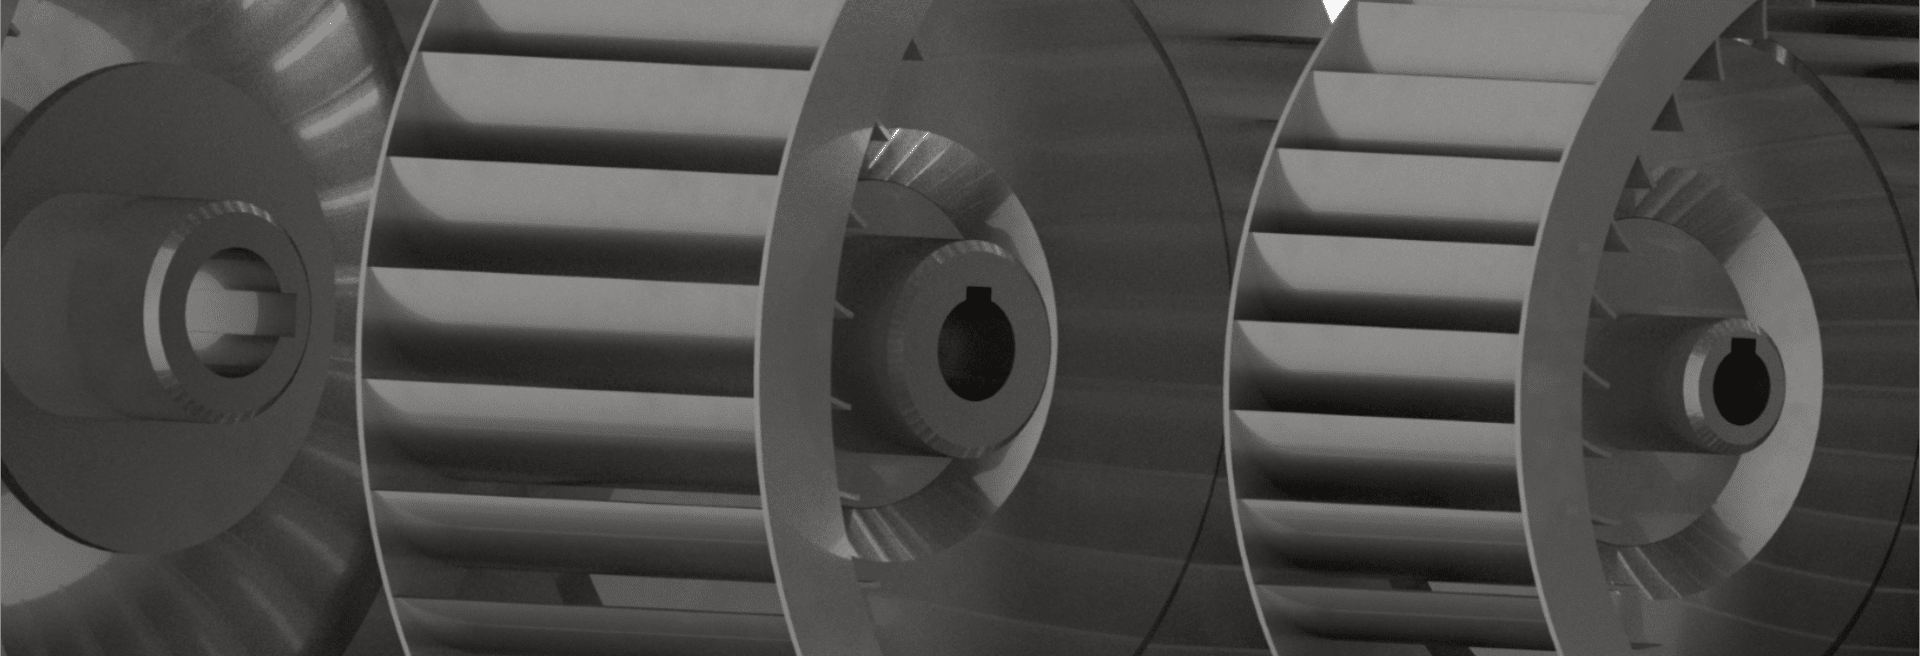 Ventilatorhjul